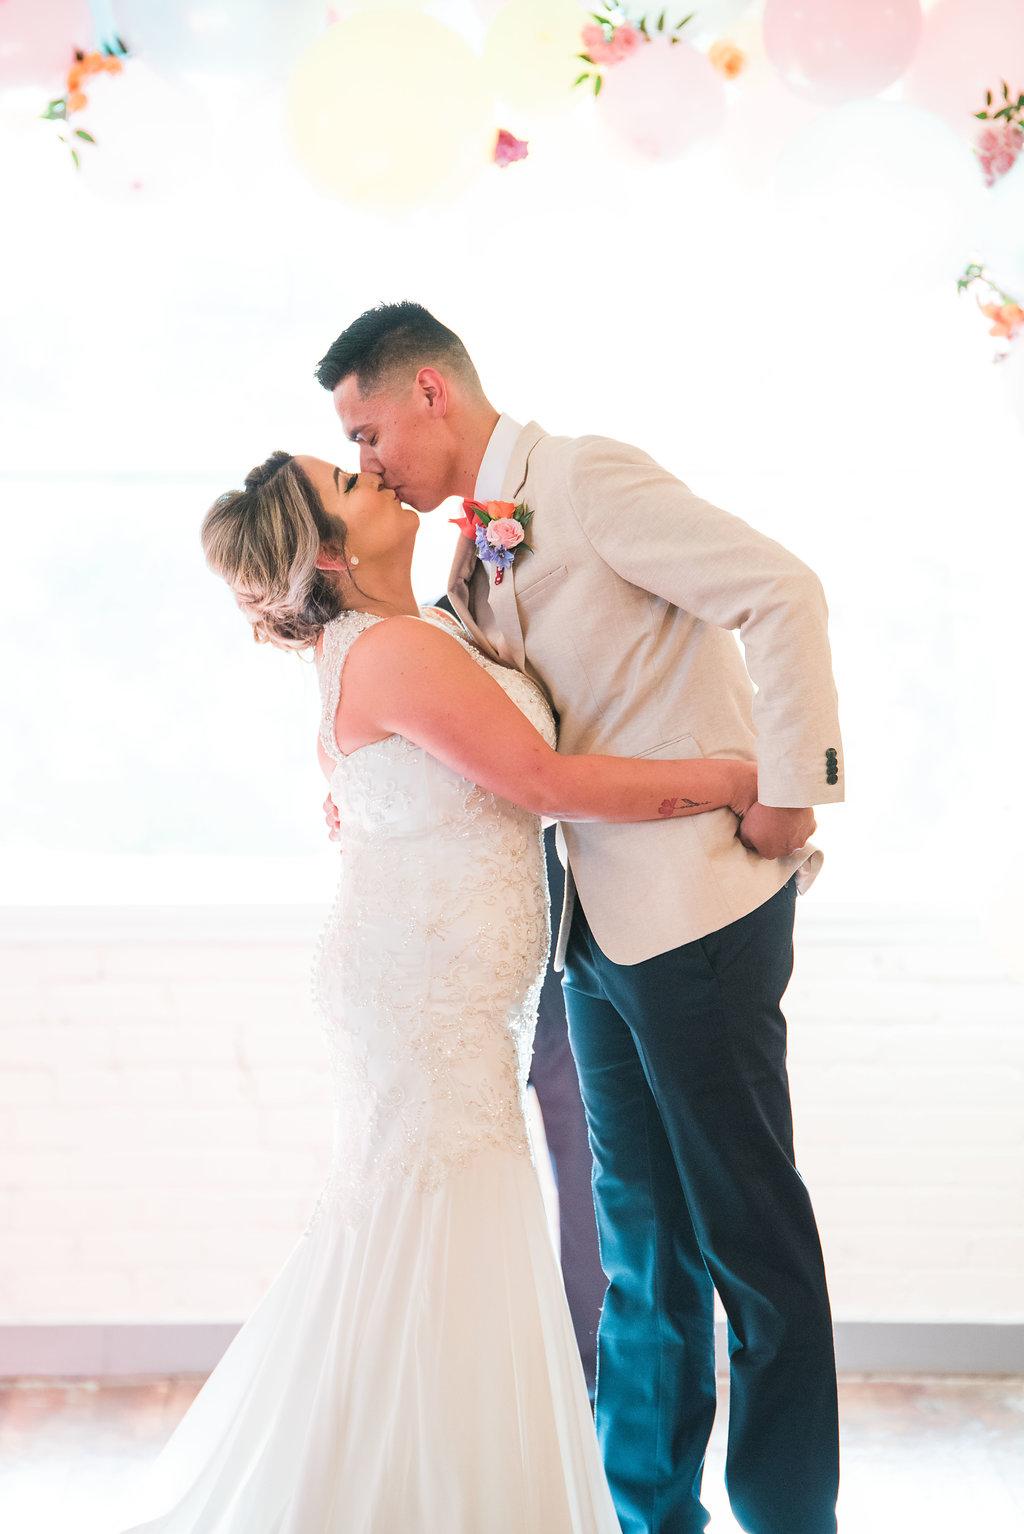 wedding ceremonies - https://ruffledblog.com/modern-playful-texas-carnival-wedding